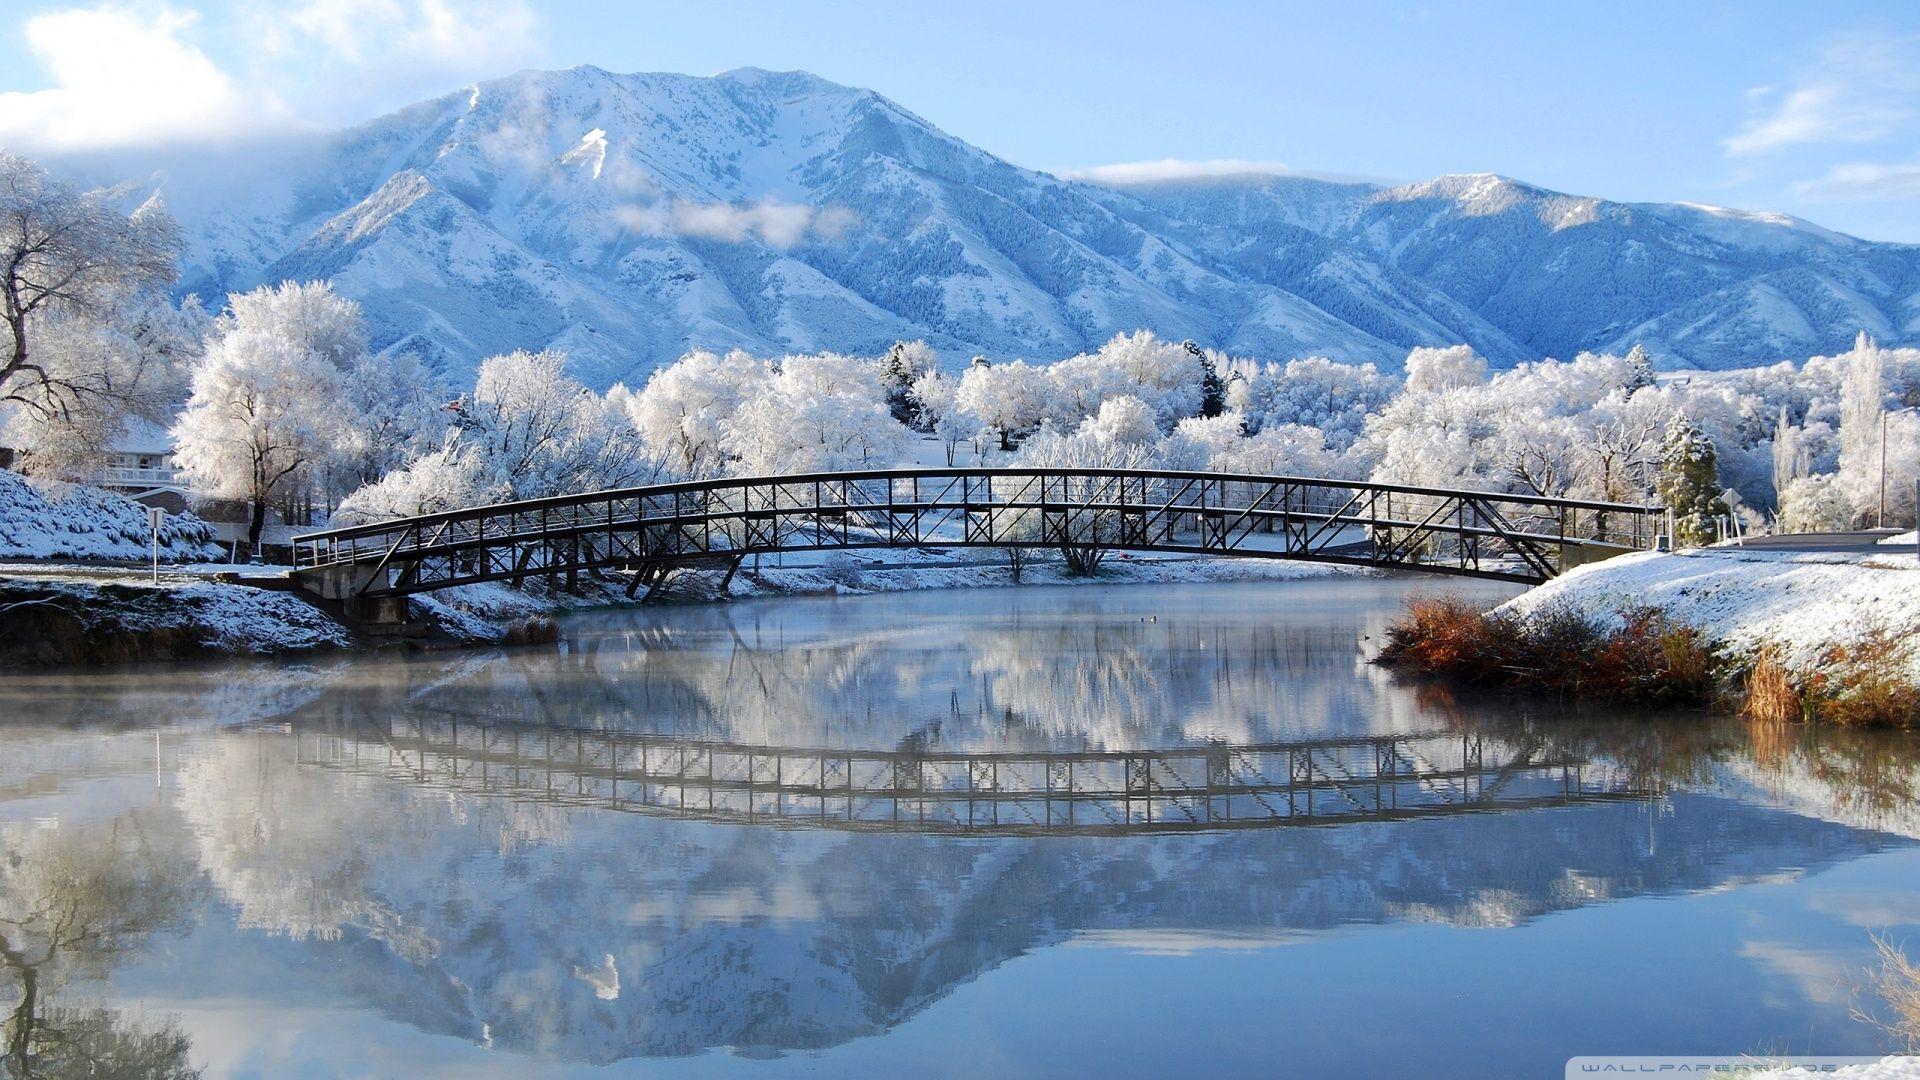 beautiful winter scene hd desktop wallpaper widescreen high